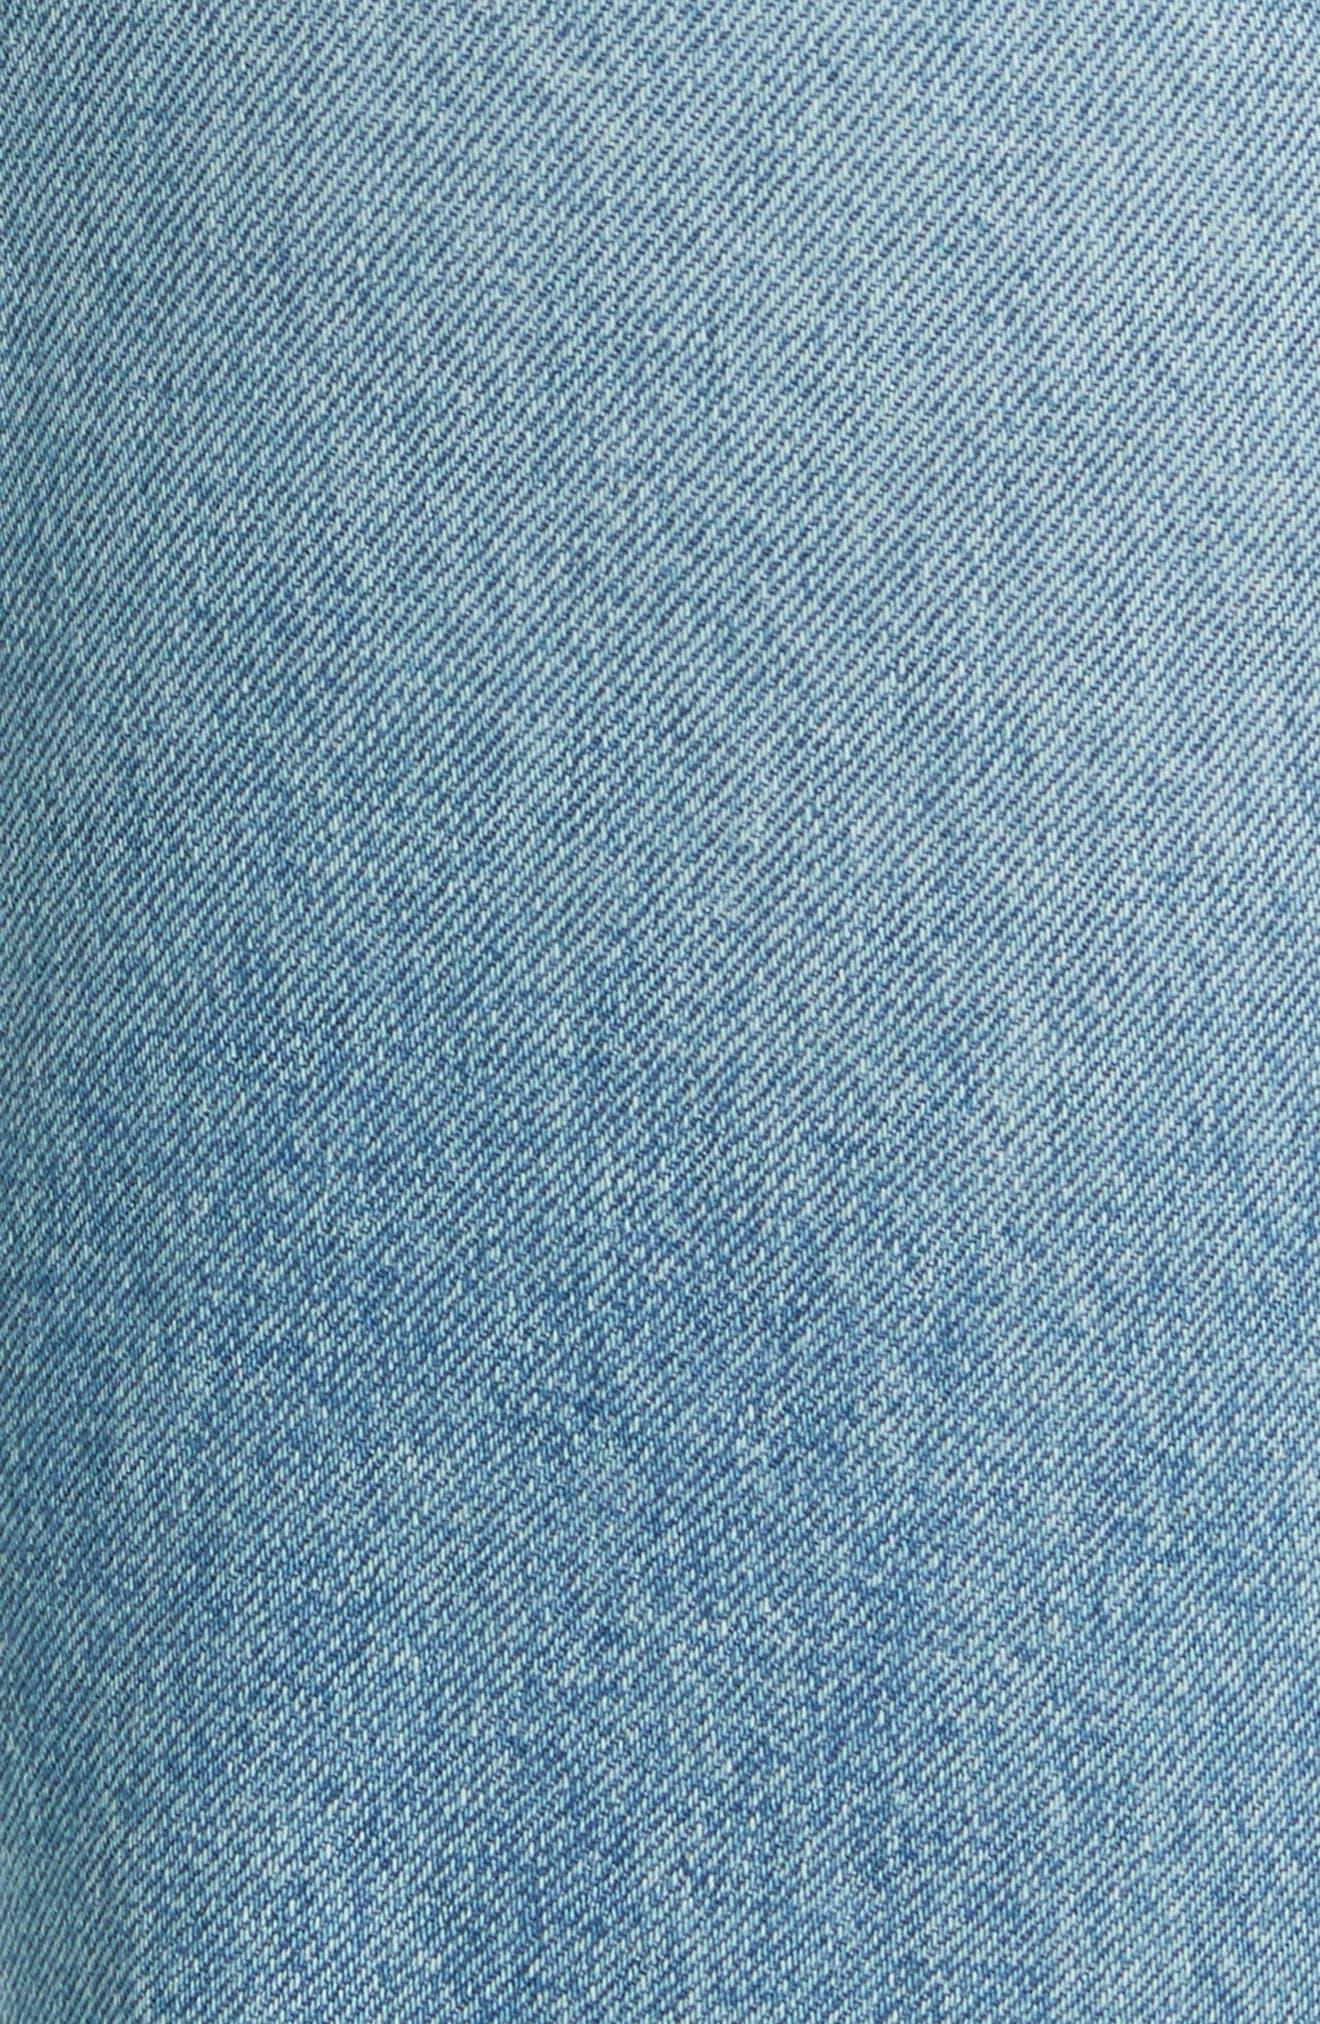 Maran Wide Leg Crop Jeans,                             Alternate thumbnail 5, color,                             483